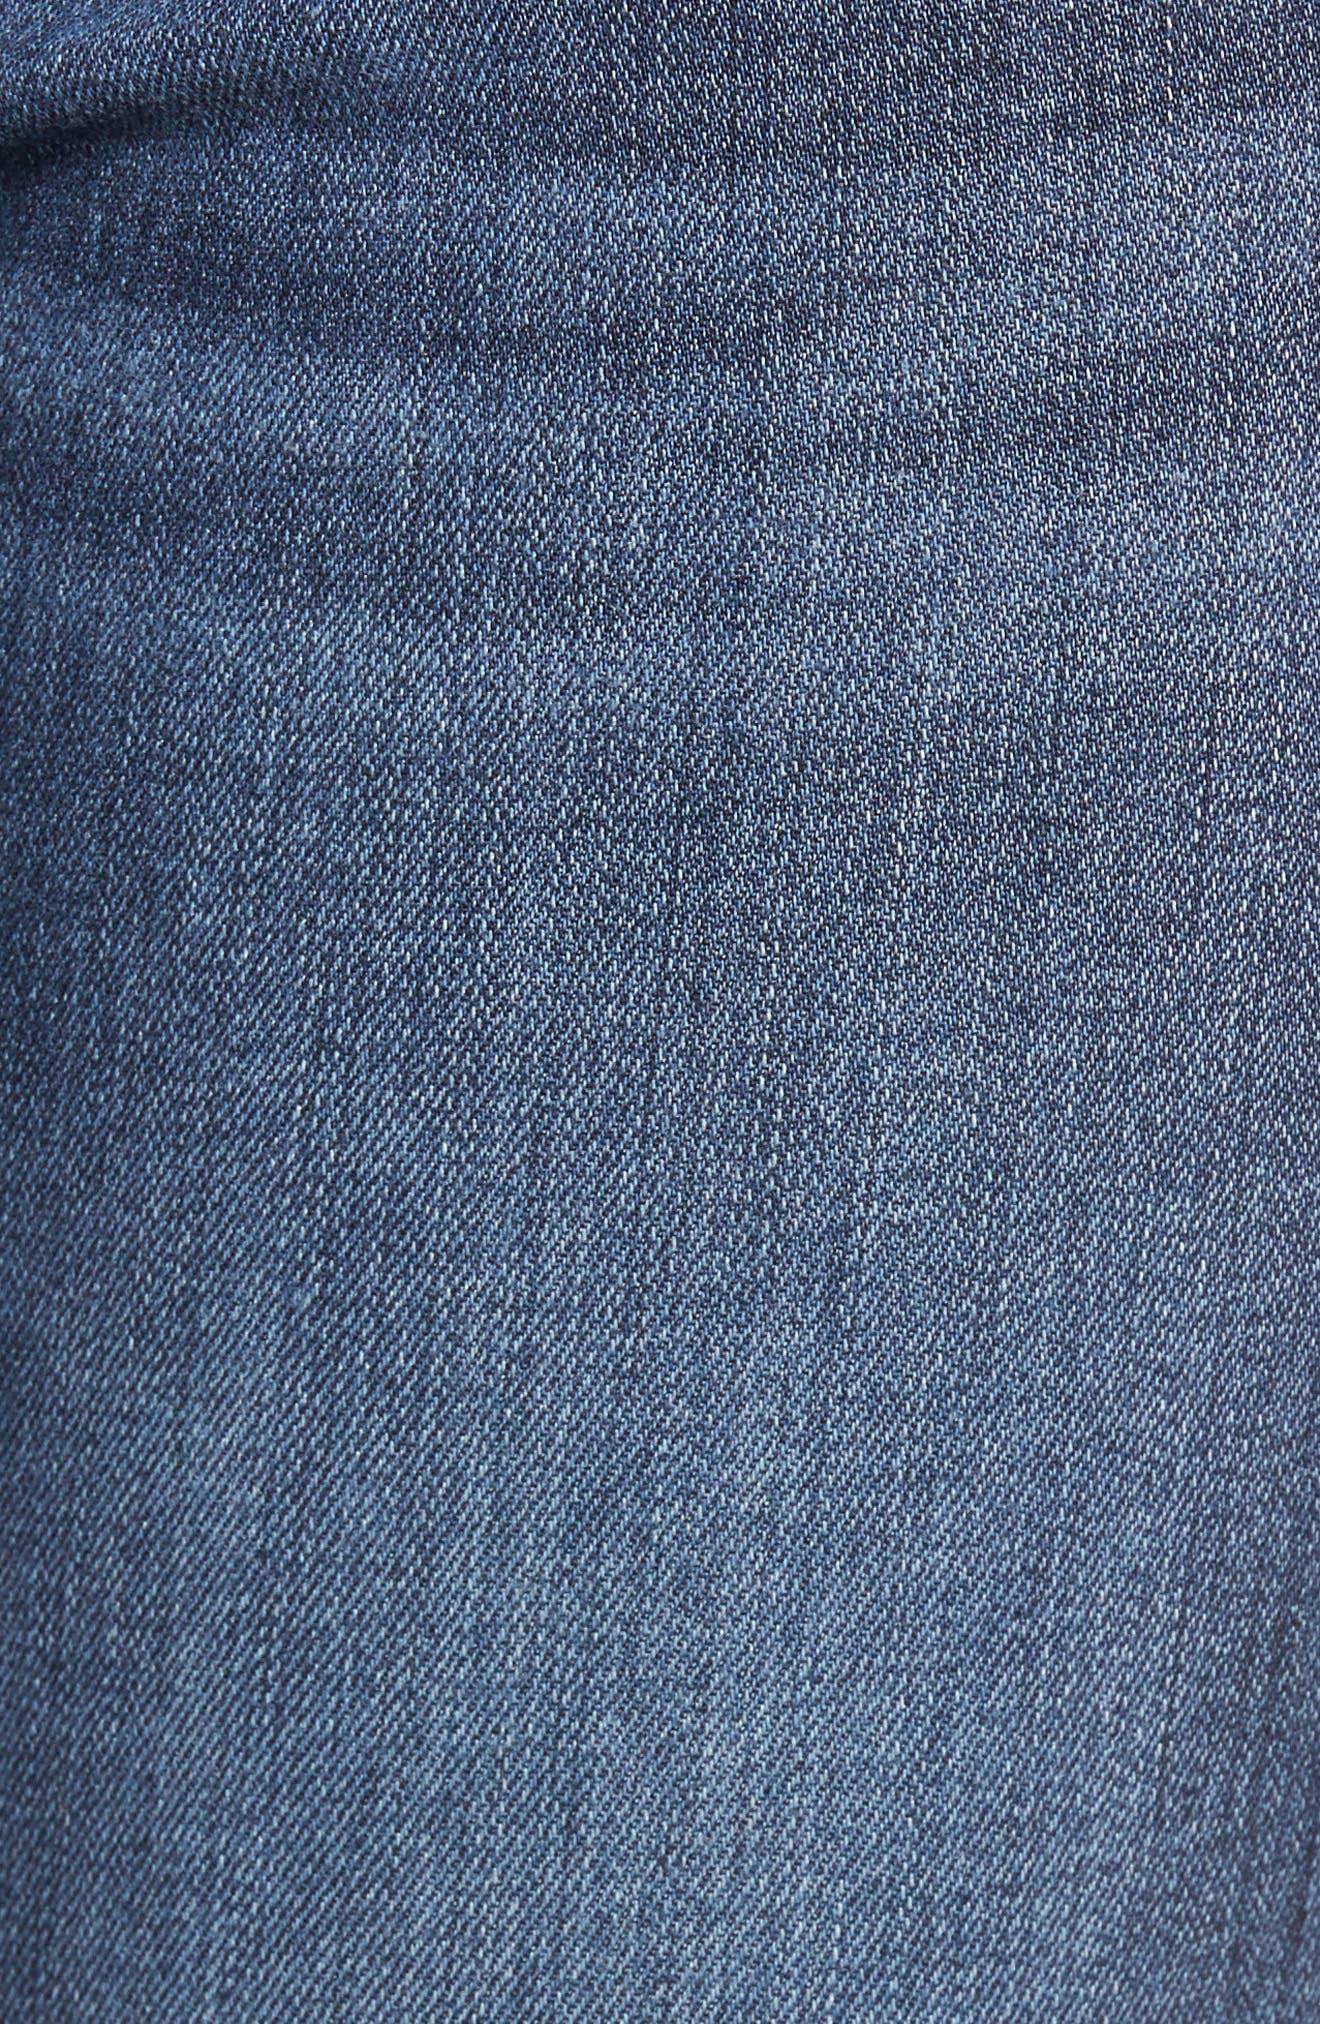 'Krista' Super Skinny Jeans,                             Alternate thumbnail 19, color,